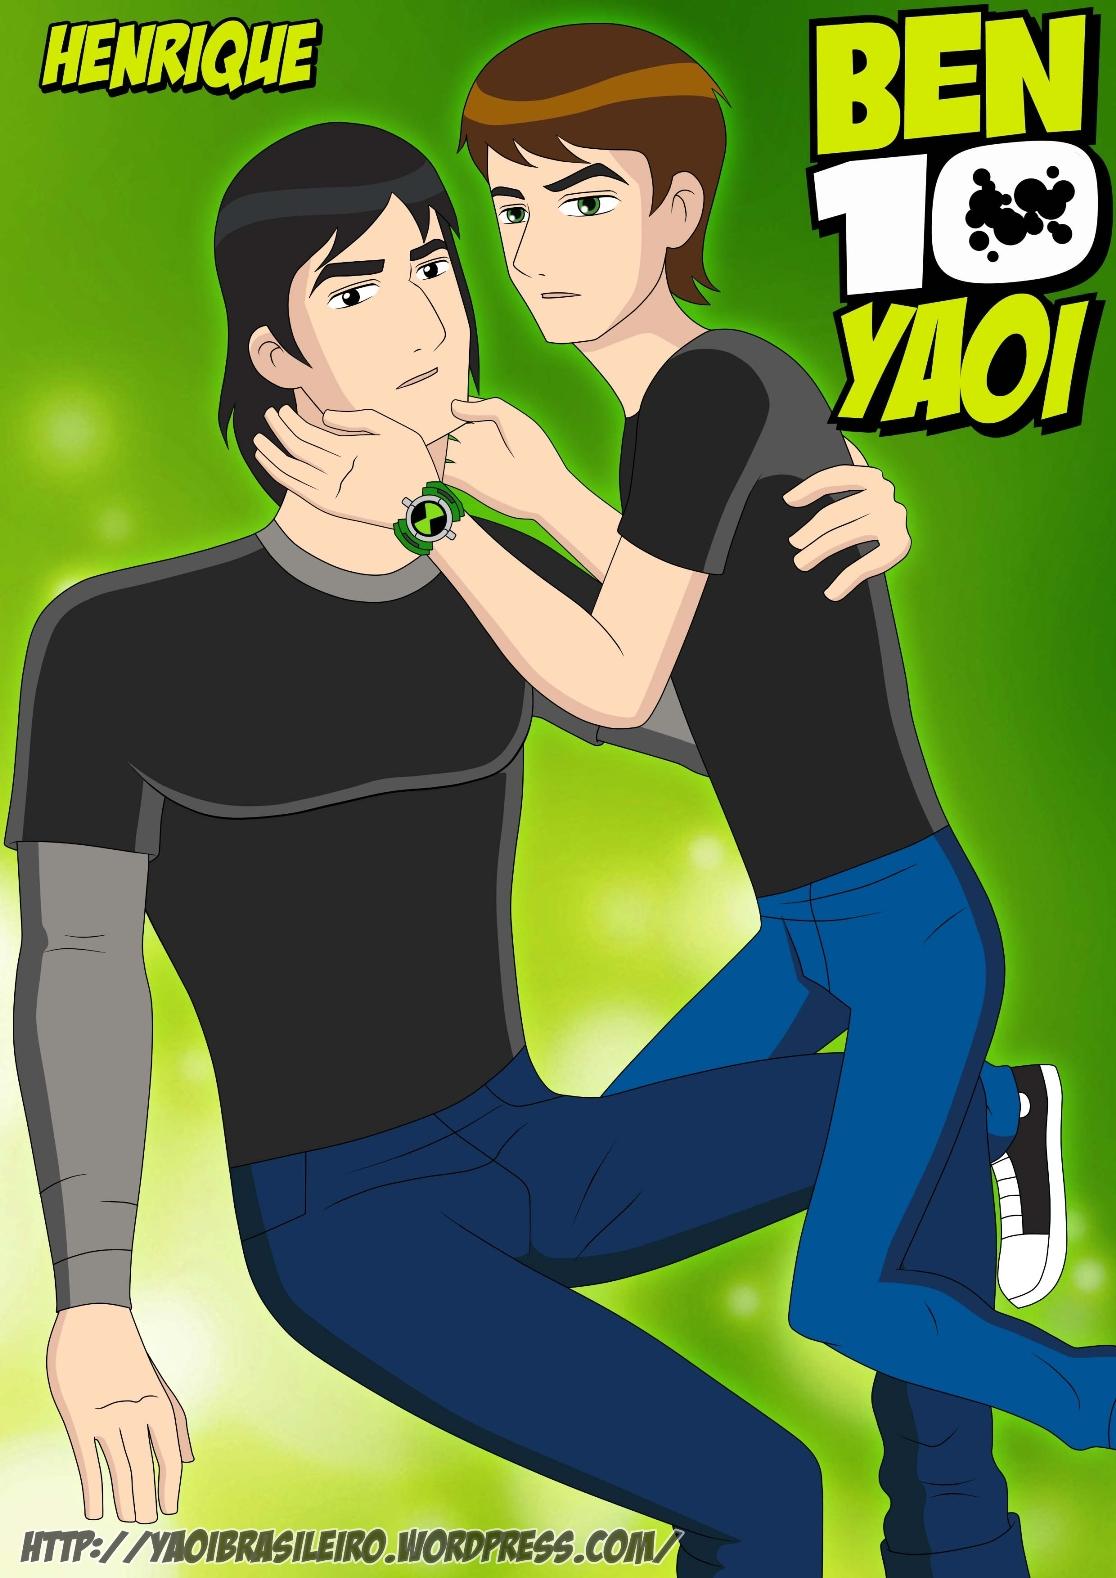 10 gay com: